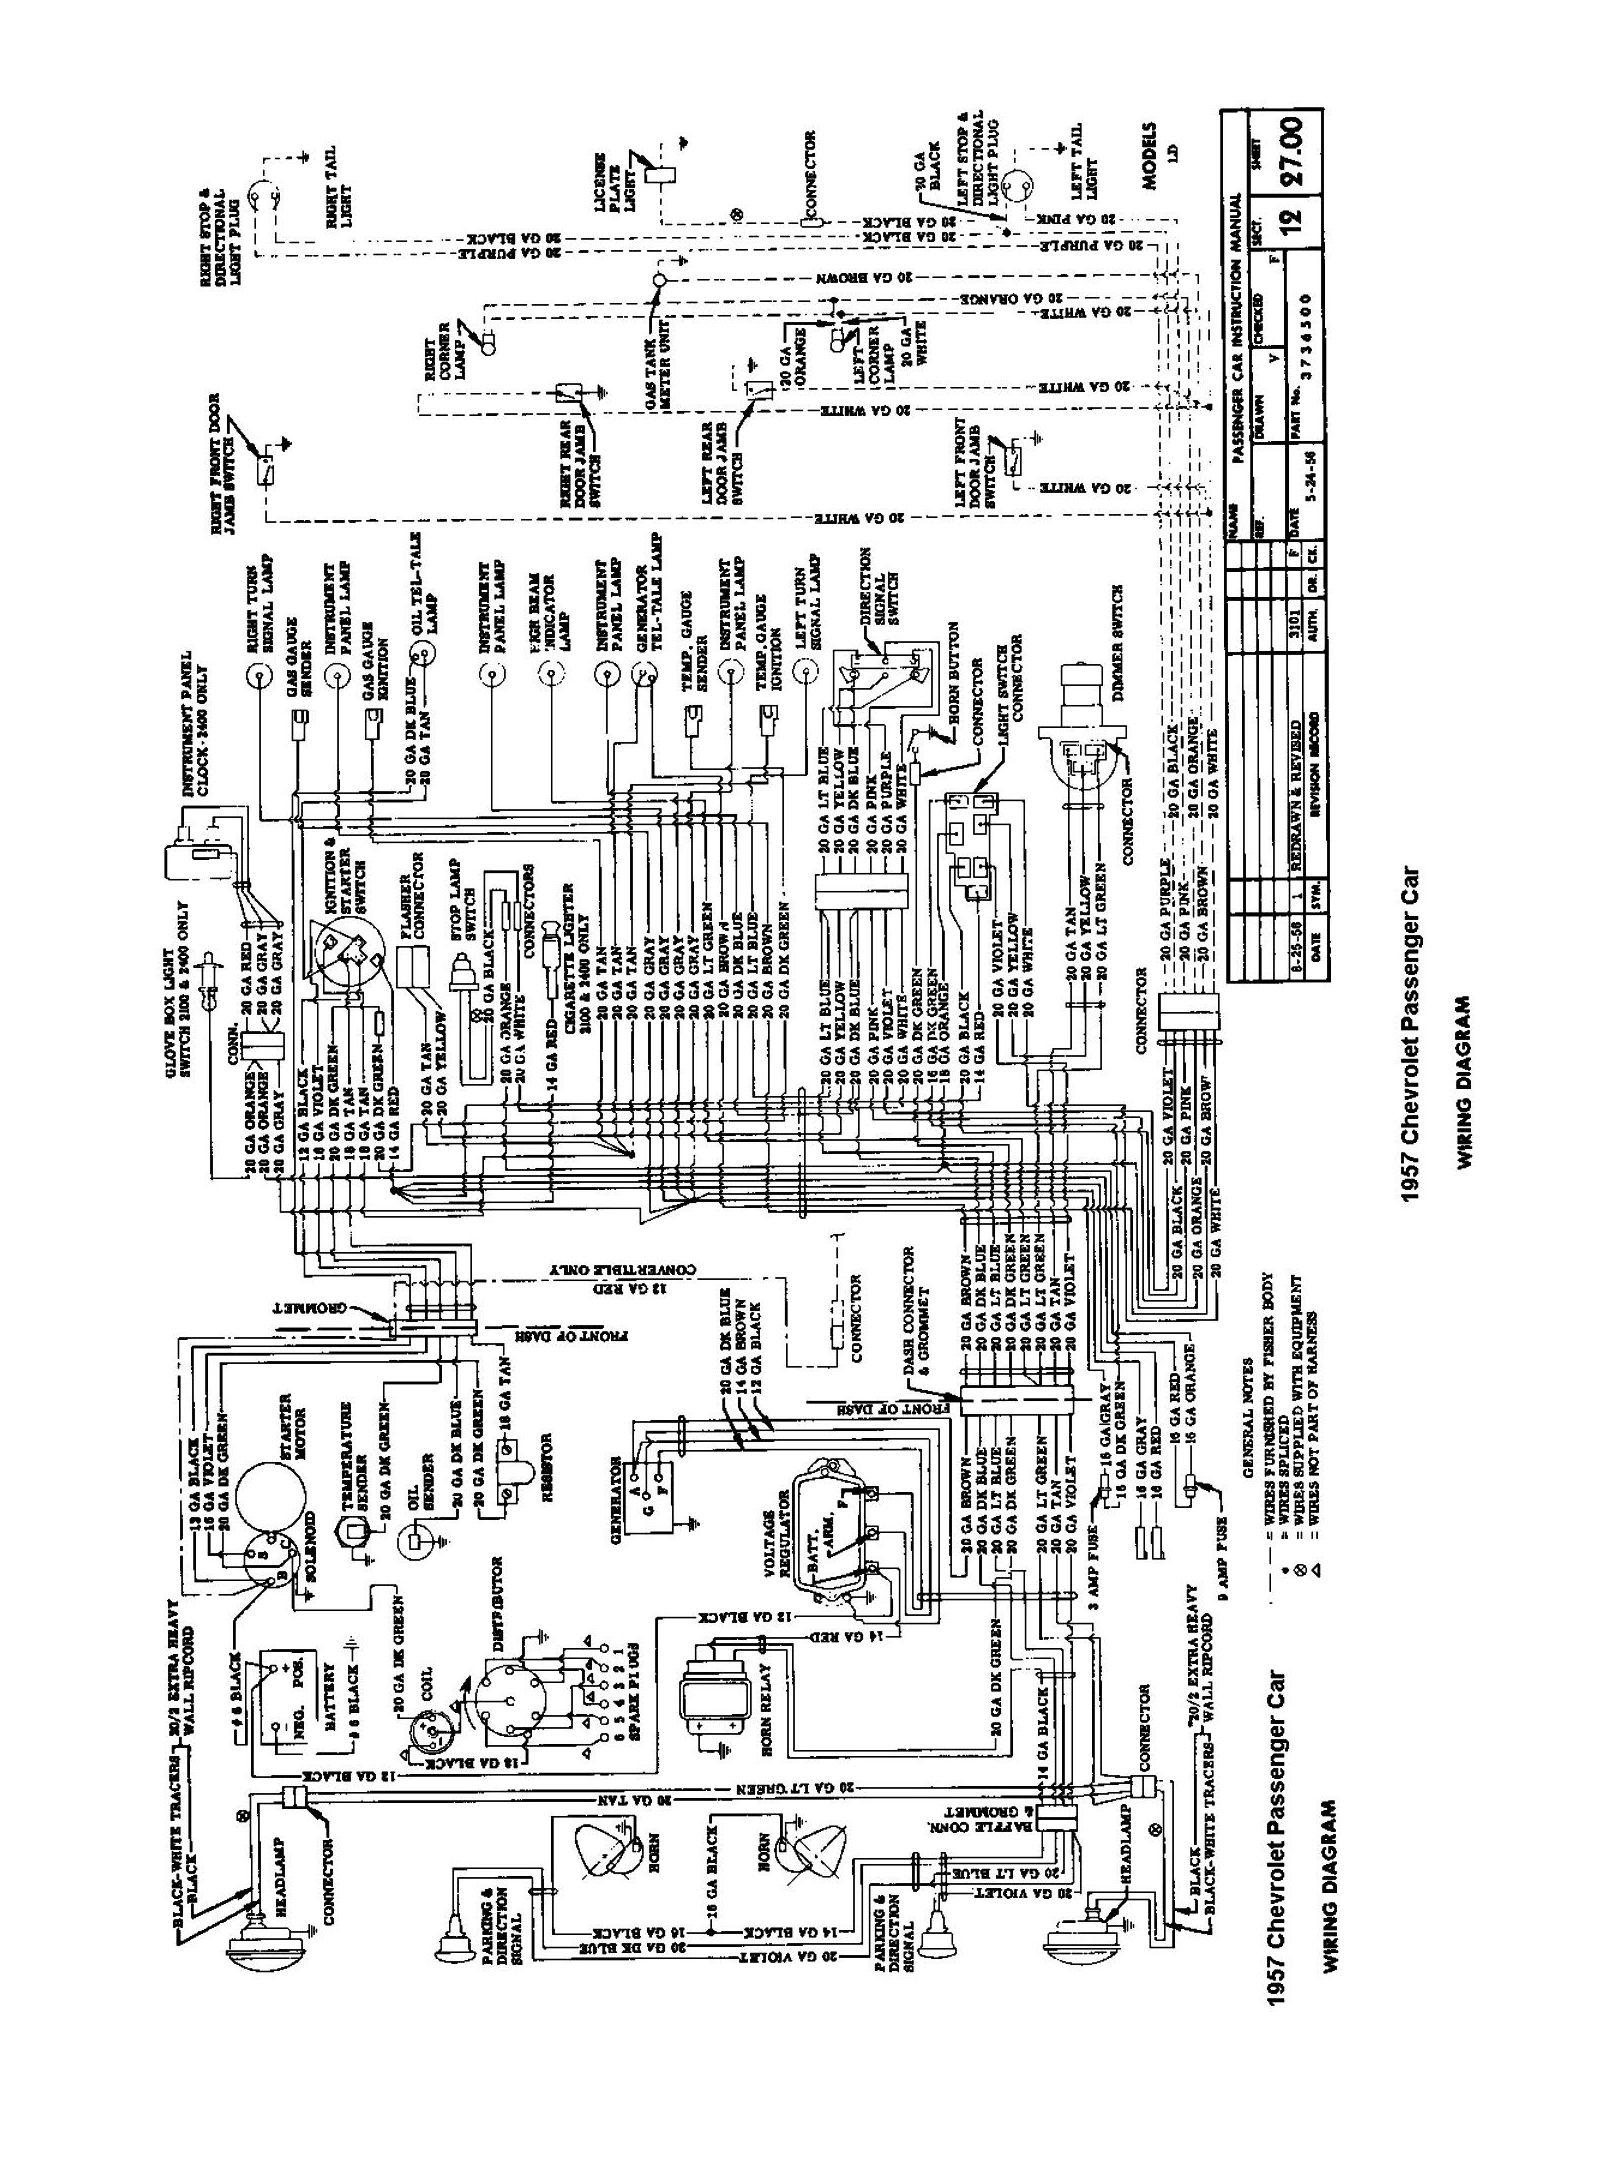 cars wiring diagrams msd 6m 2 diagram chevy 1957 car passenger